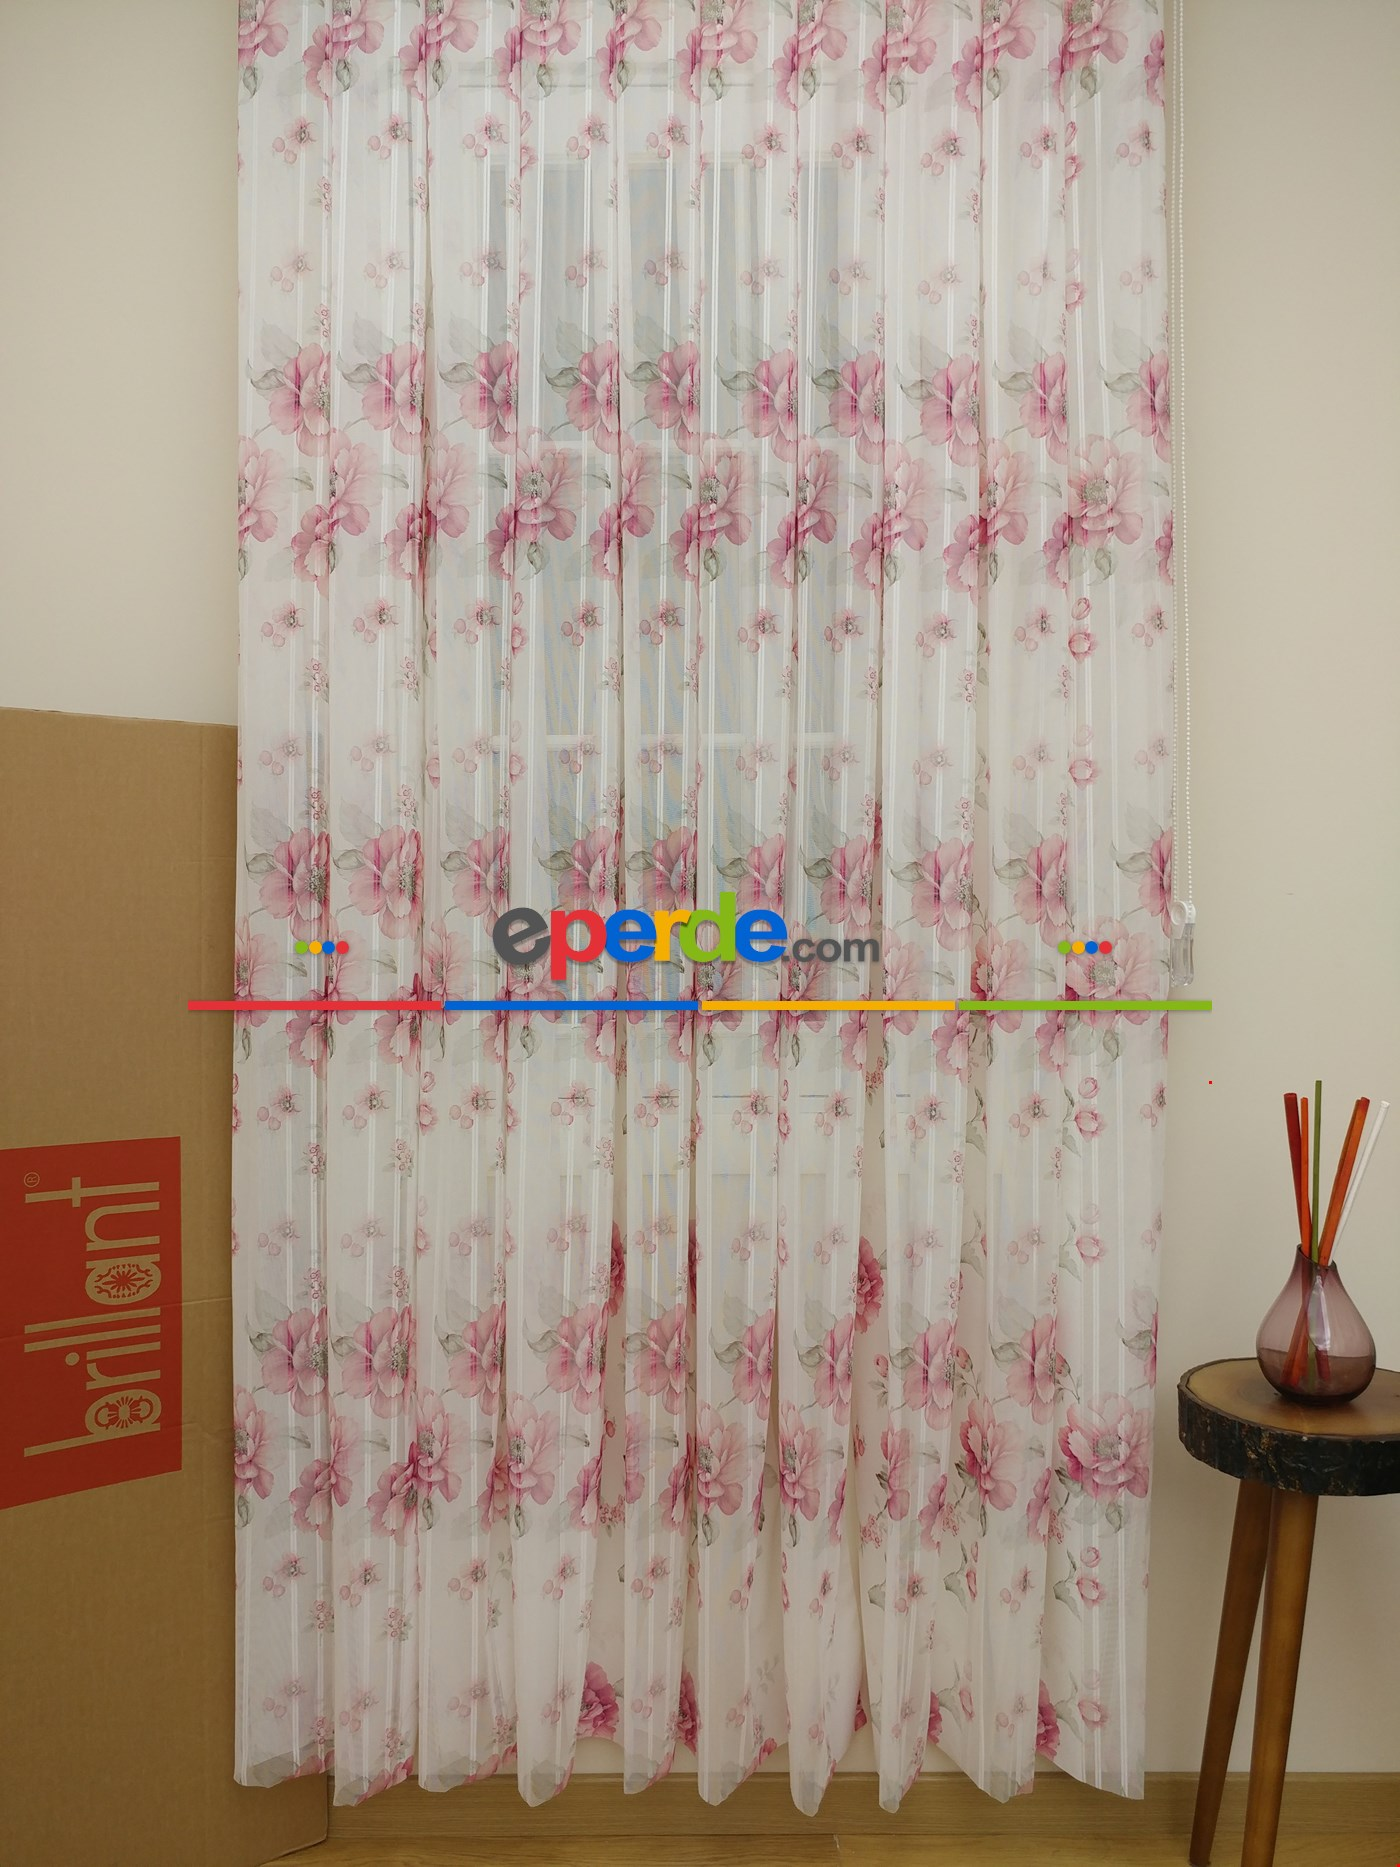 Brillant Dikey Tül Perde 2018 New Design Pembe Pudra Pembe - Ekru -  Çok Renkli 2